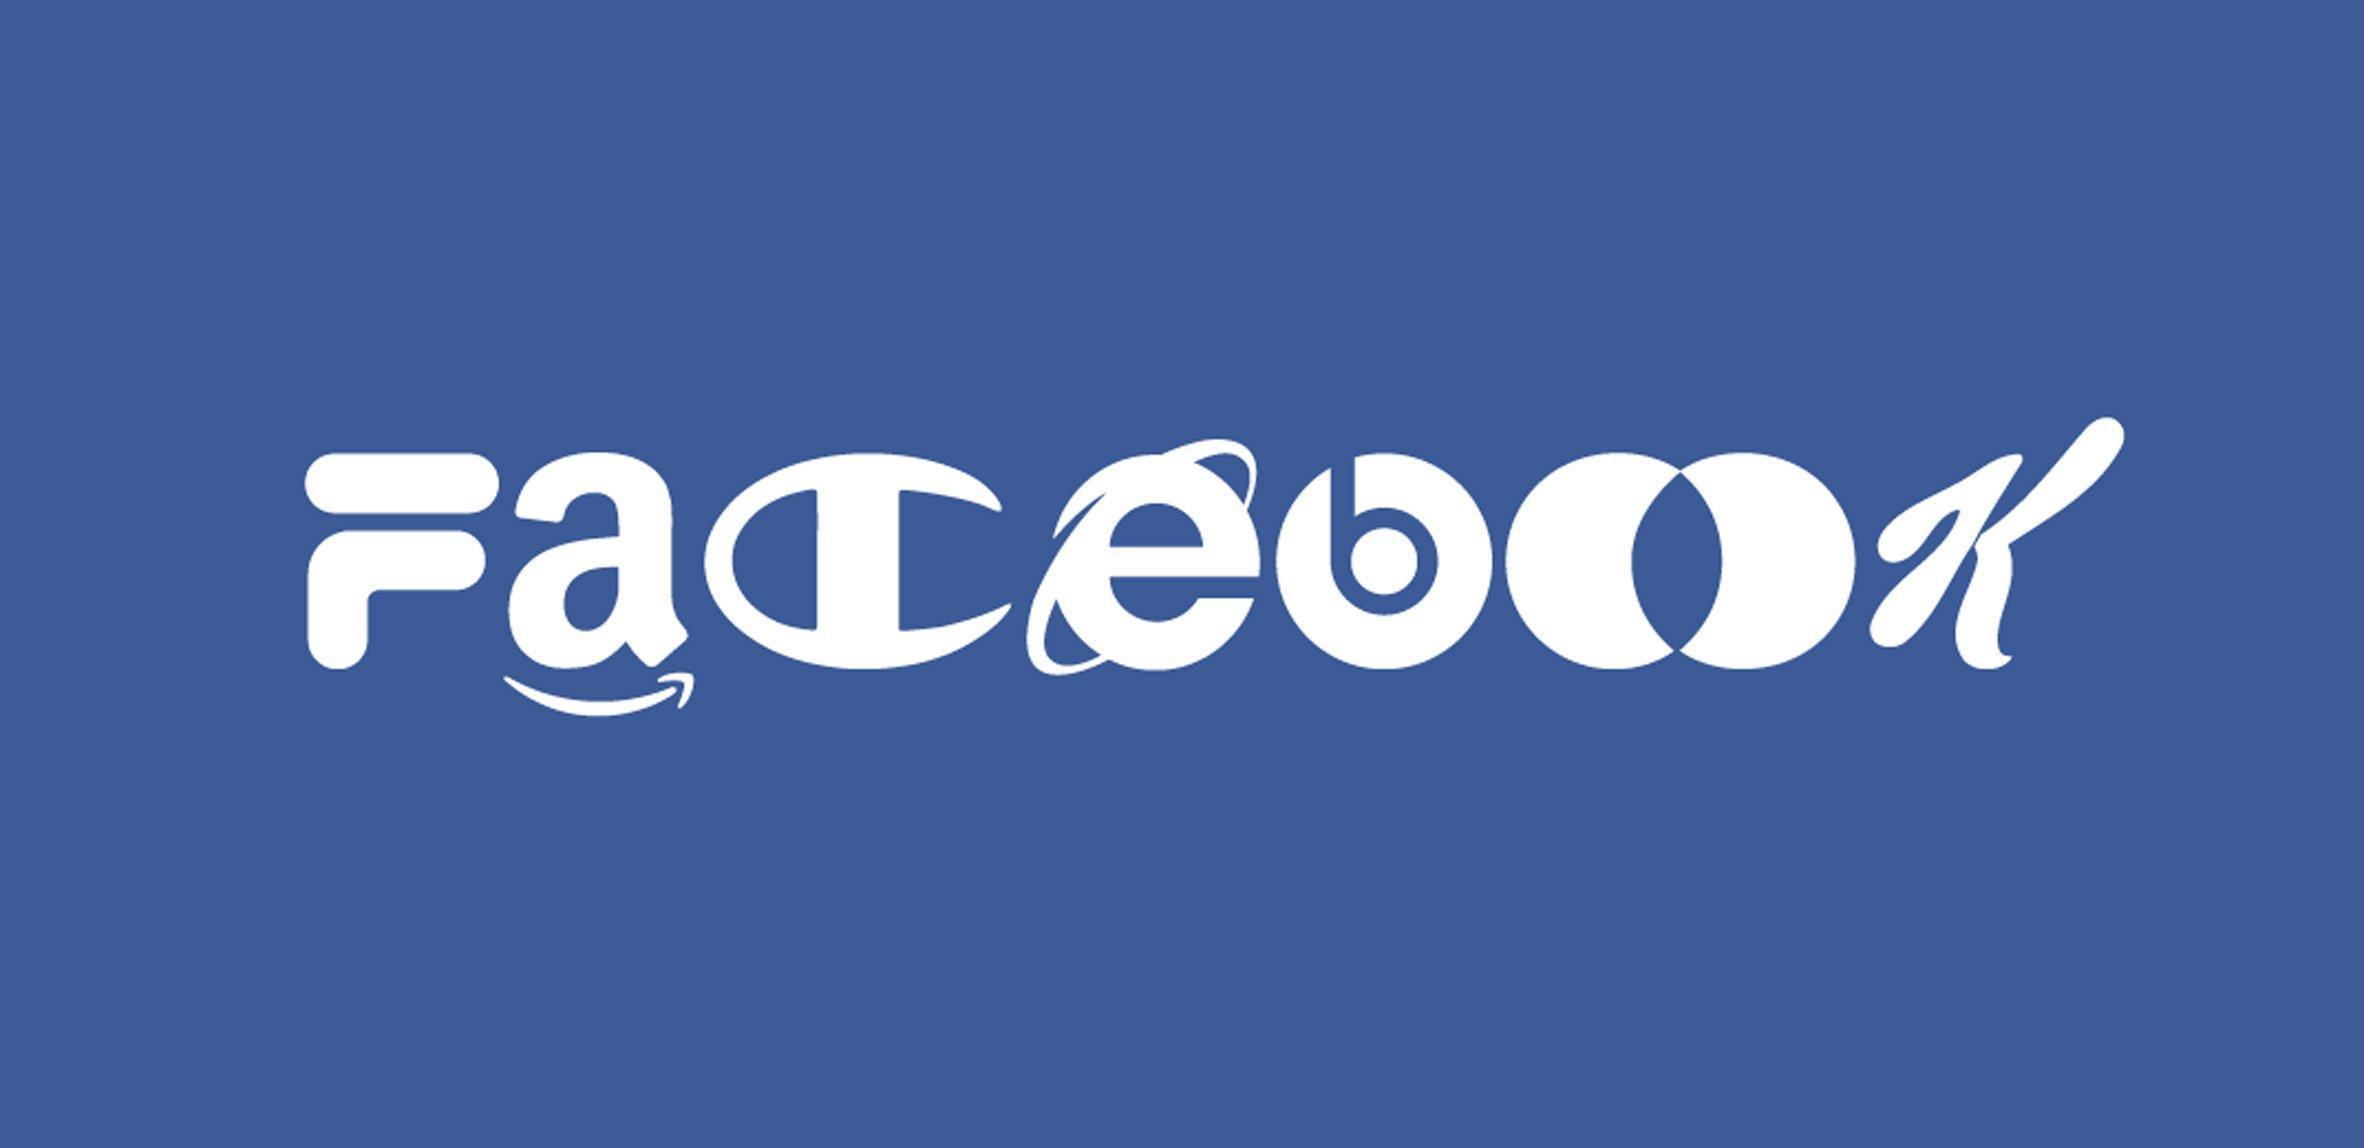 Brand New Roman Font Logo Facebook